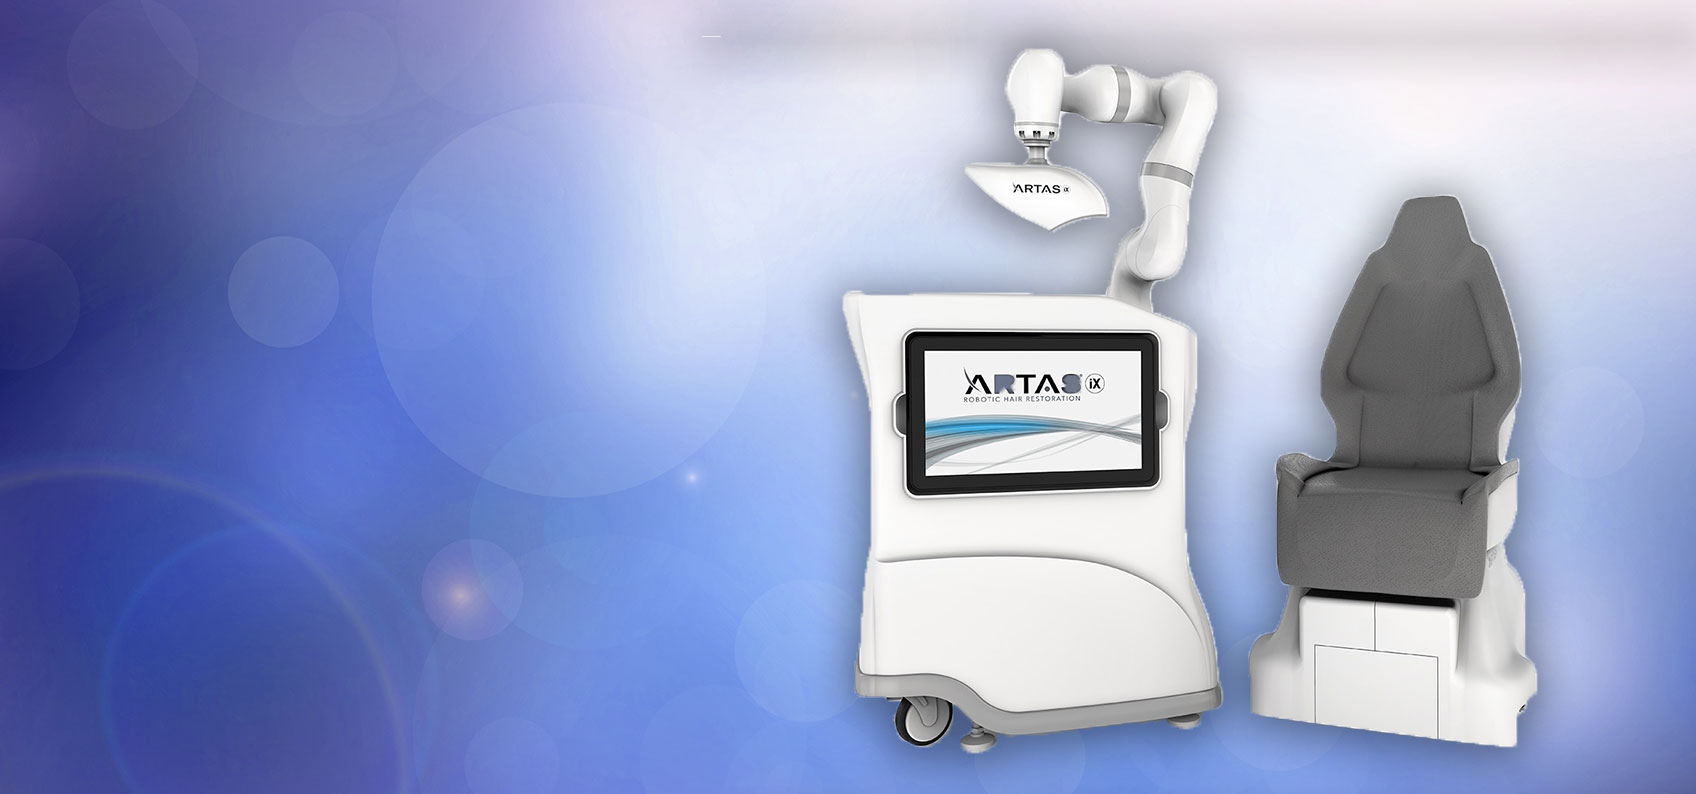 The ARTAS® Robotic Hair Restoration System